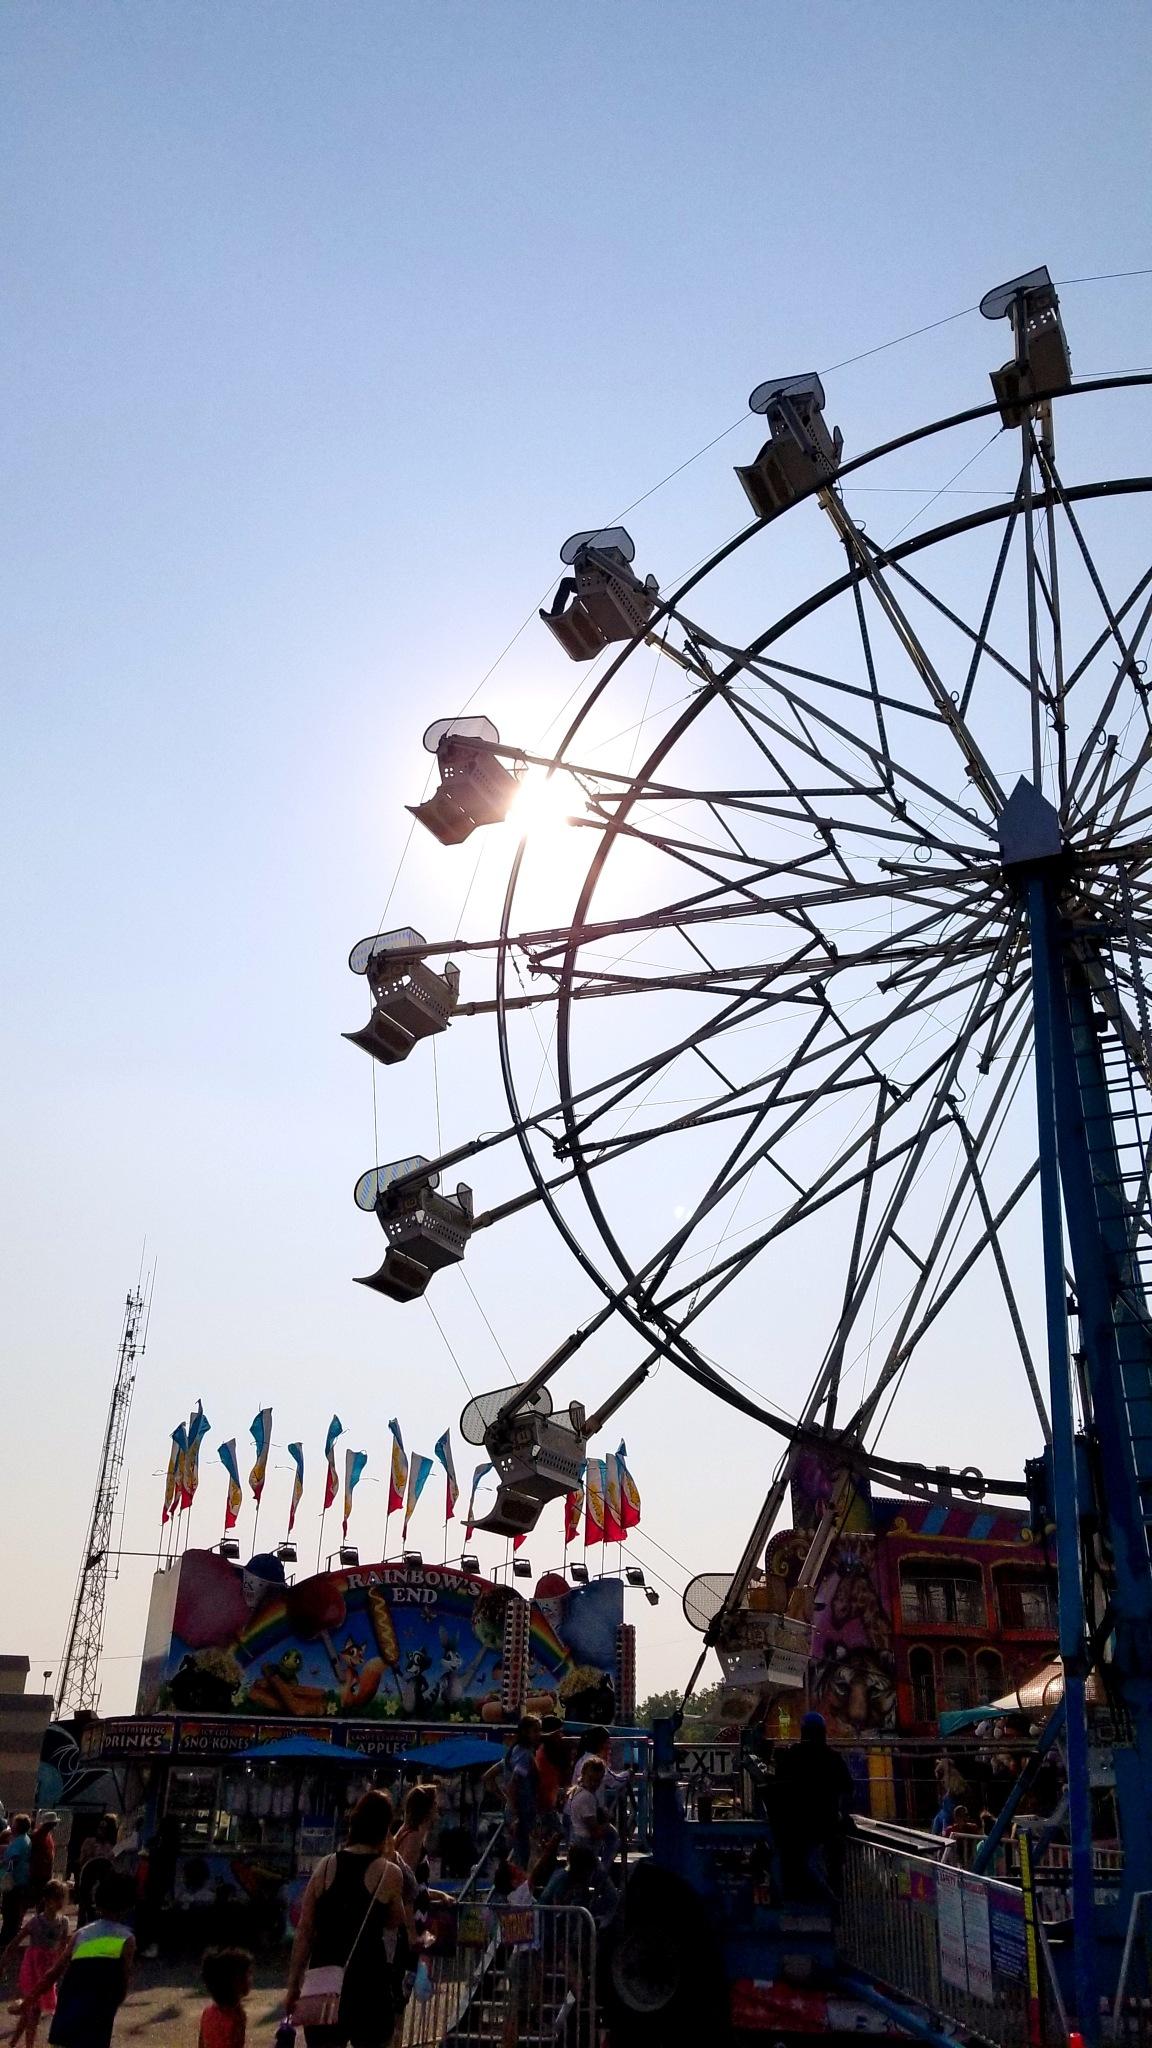 Ferris wheel silhouette by Stephen Ketchum